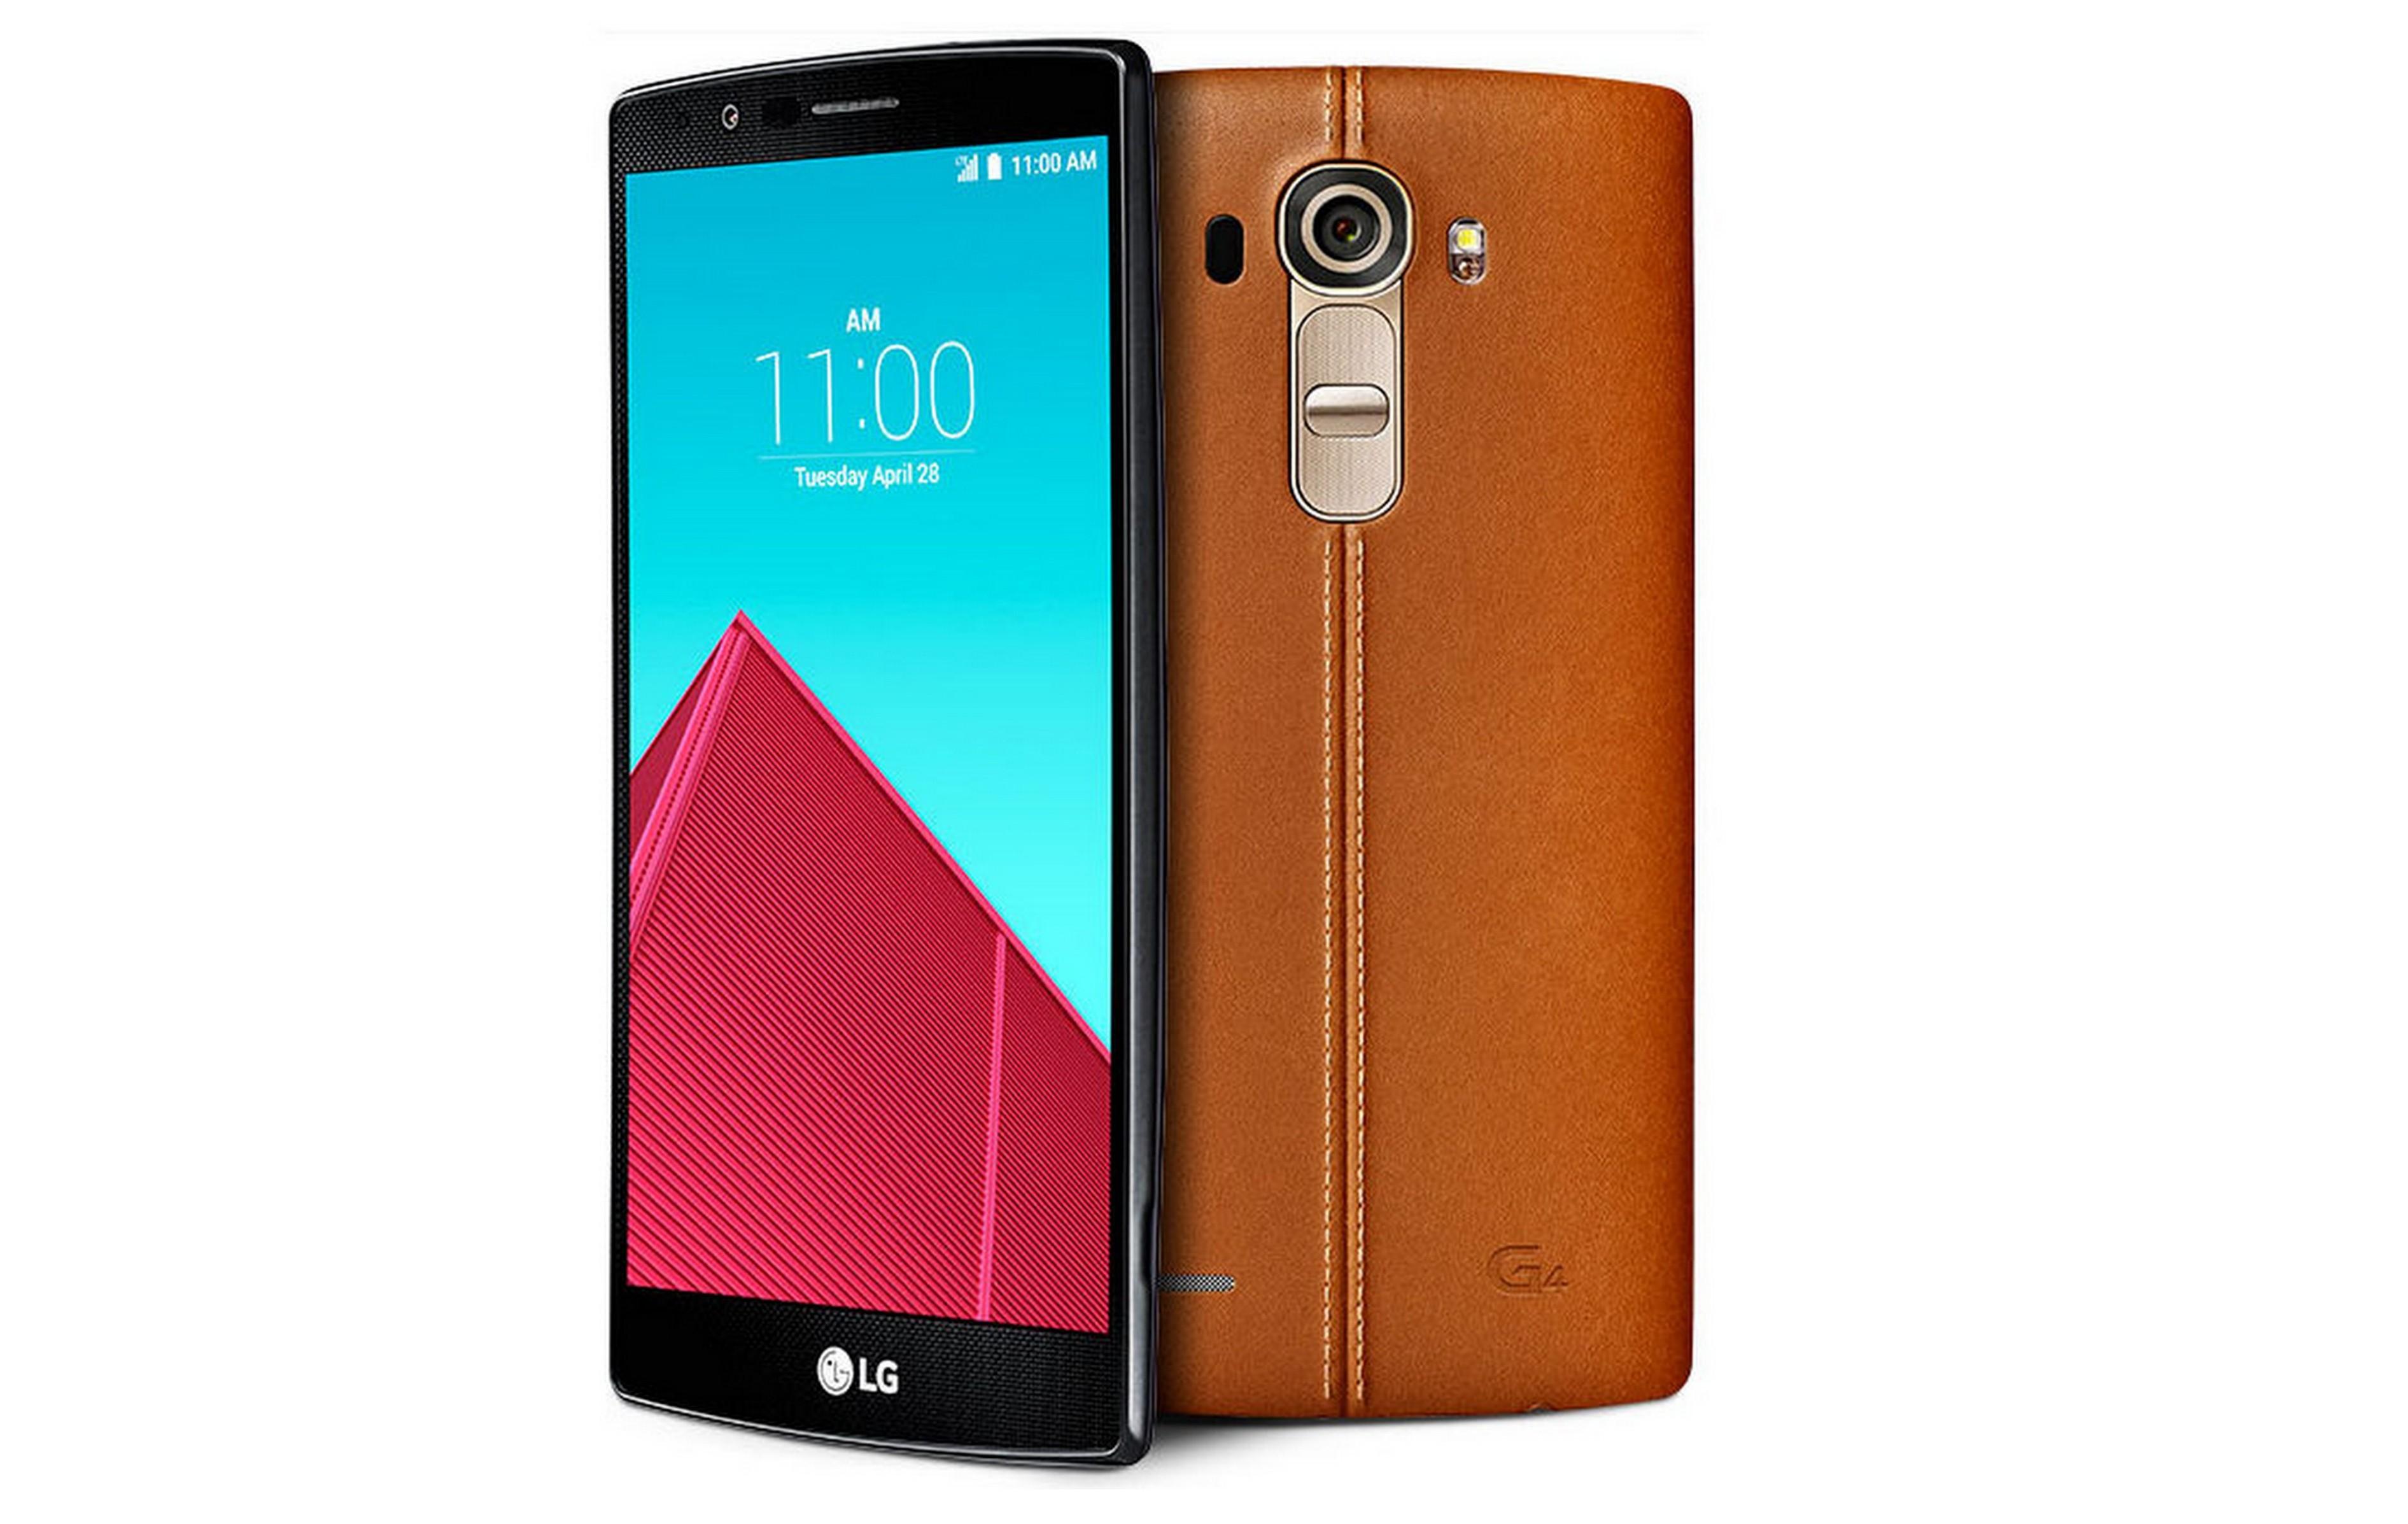 Photo of طريقة تركيب اكسبوزد على جهاز LG G4